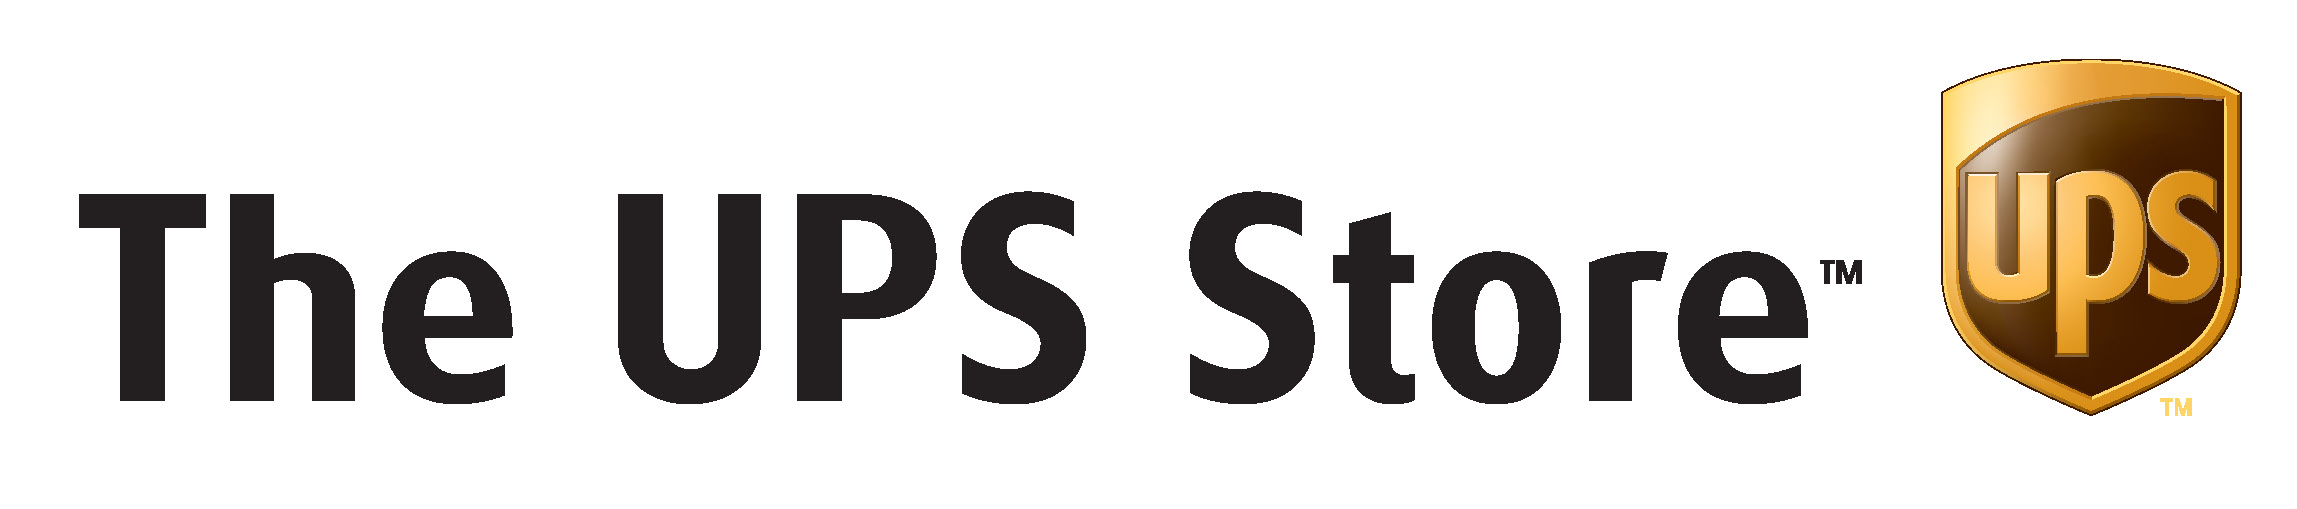 new ups logo png transparent new ups logo png images pluspng rh pluspng com usps vector logo ups logo vector black white